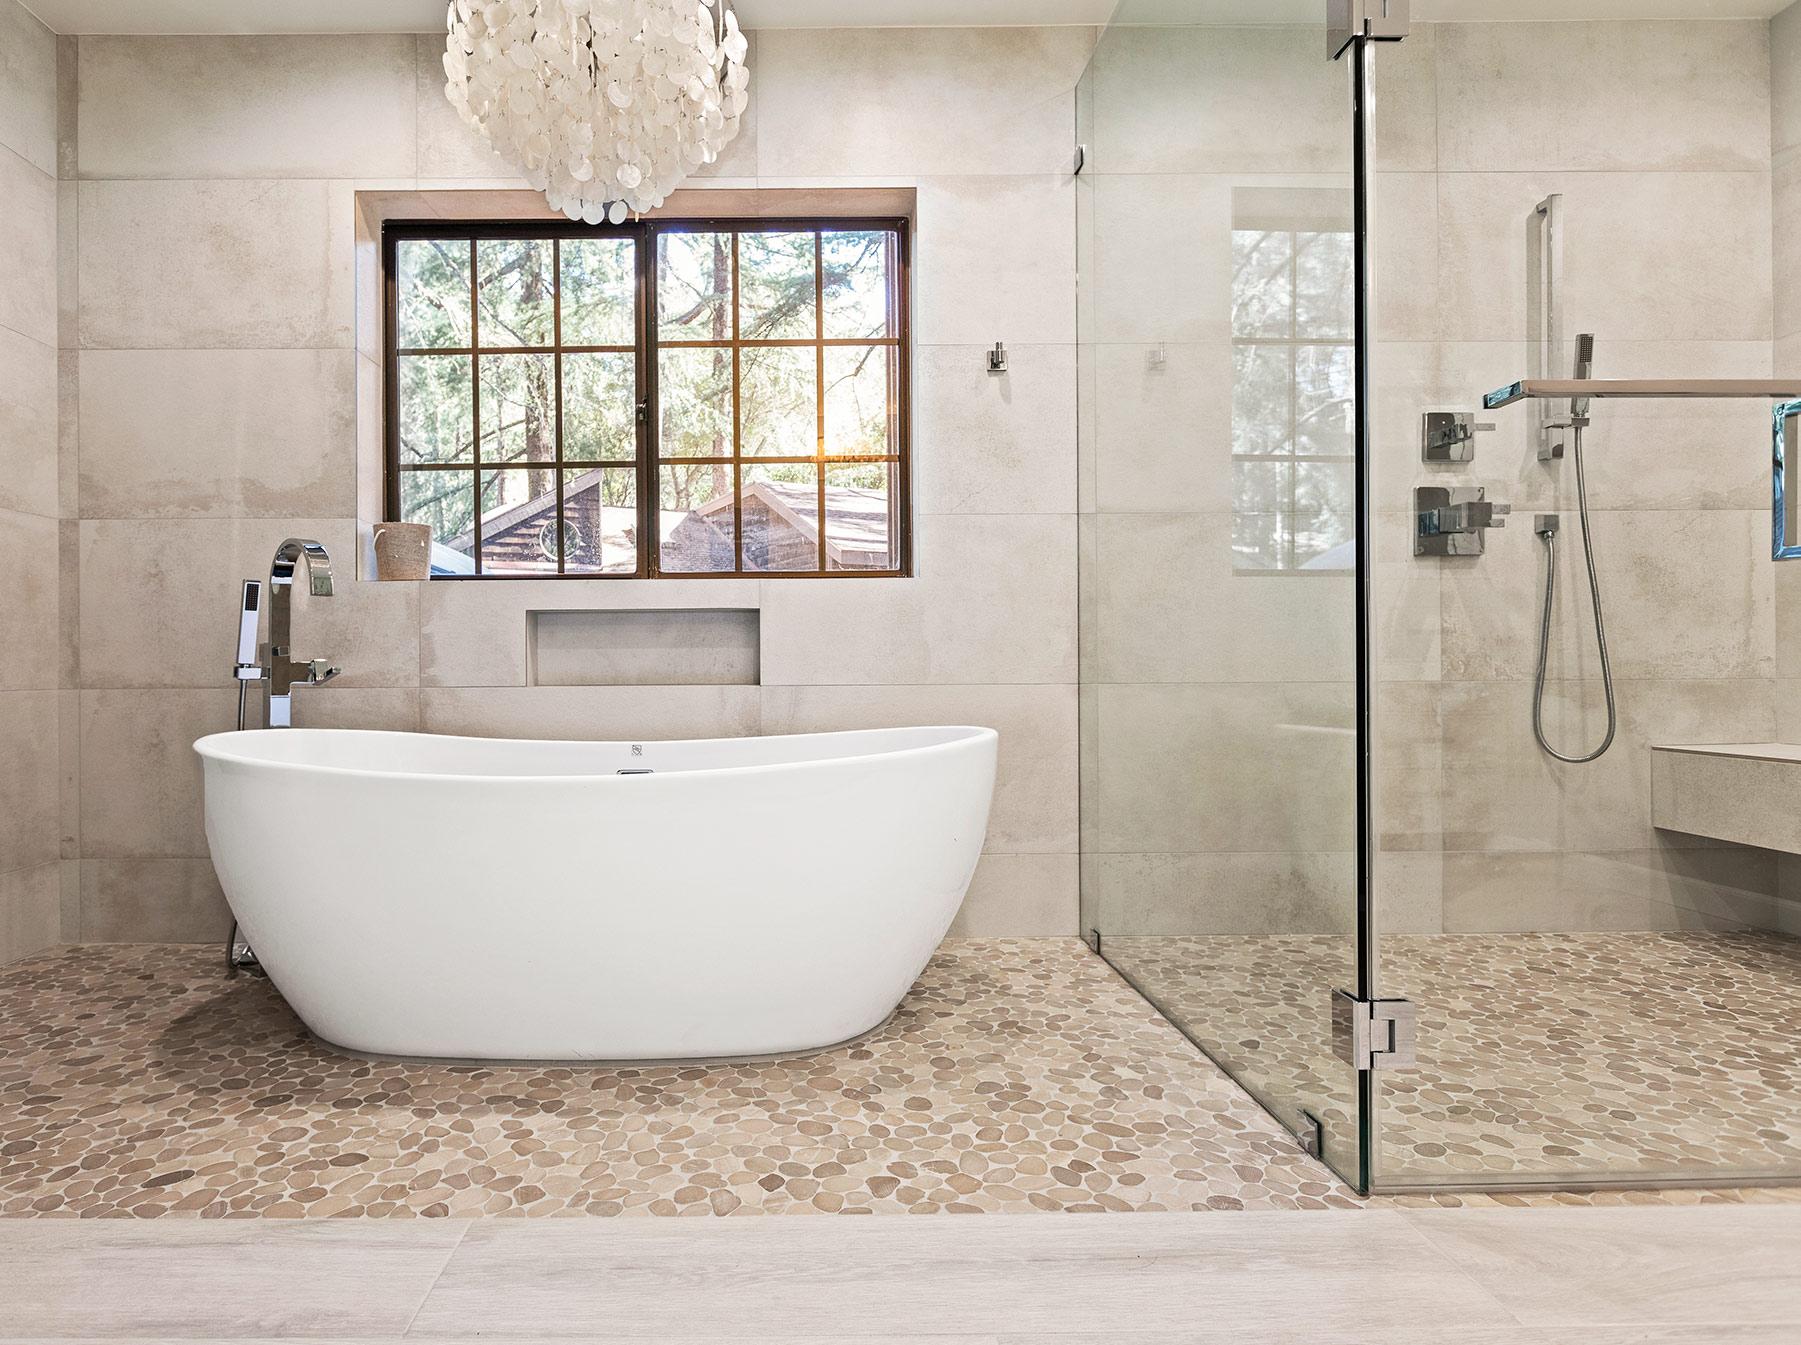 La Canada complete remodel bathroom 4 SMALL.jpg